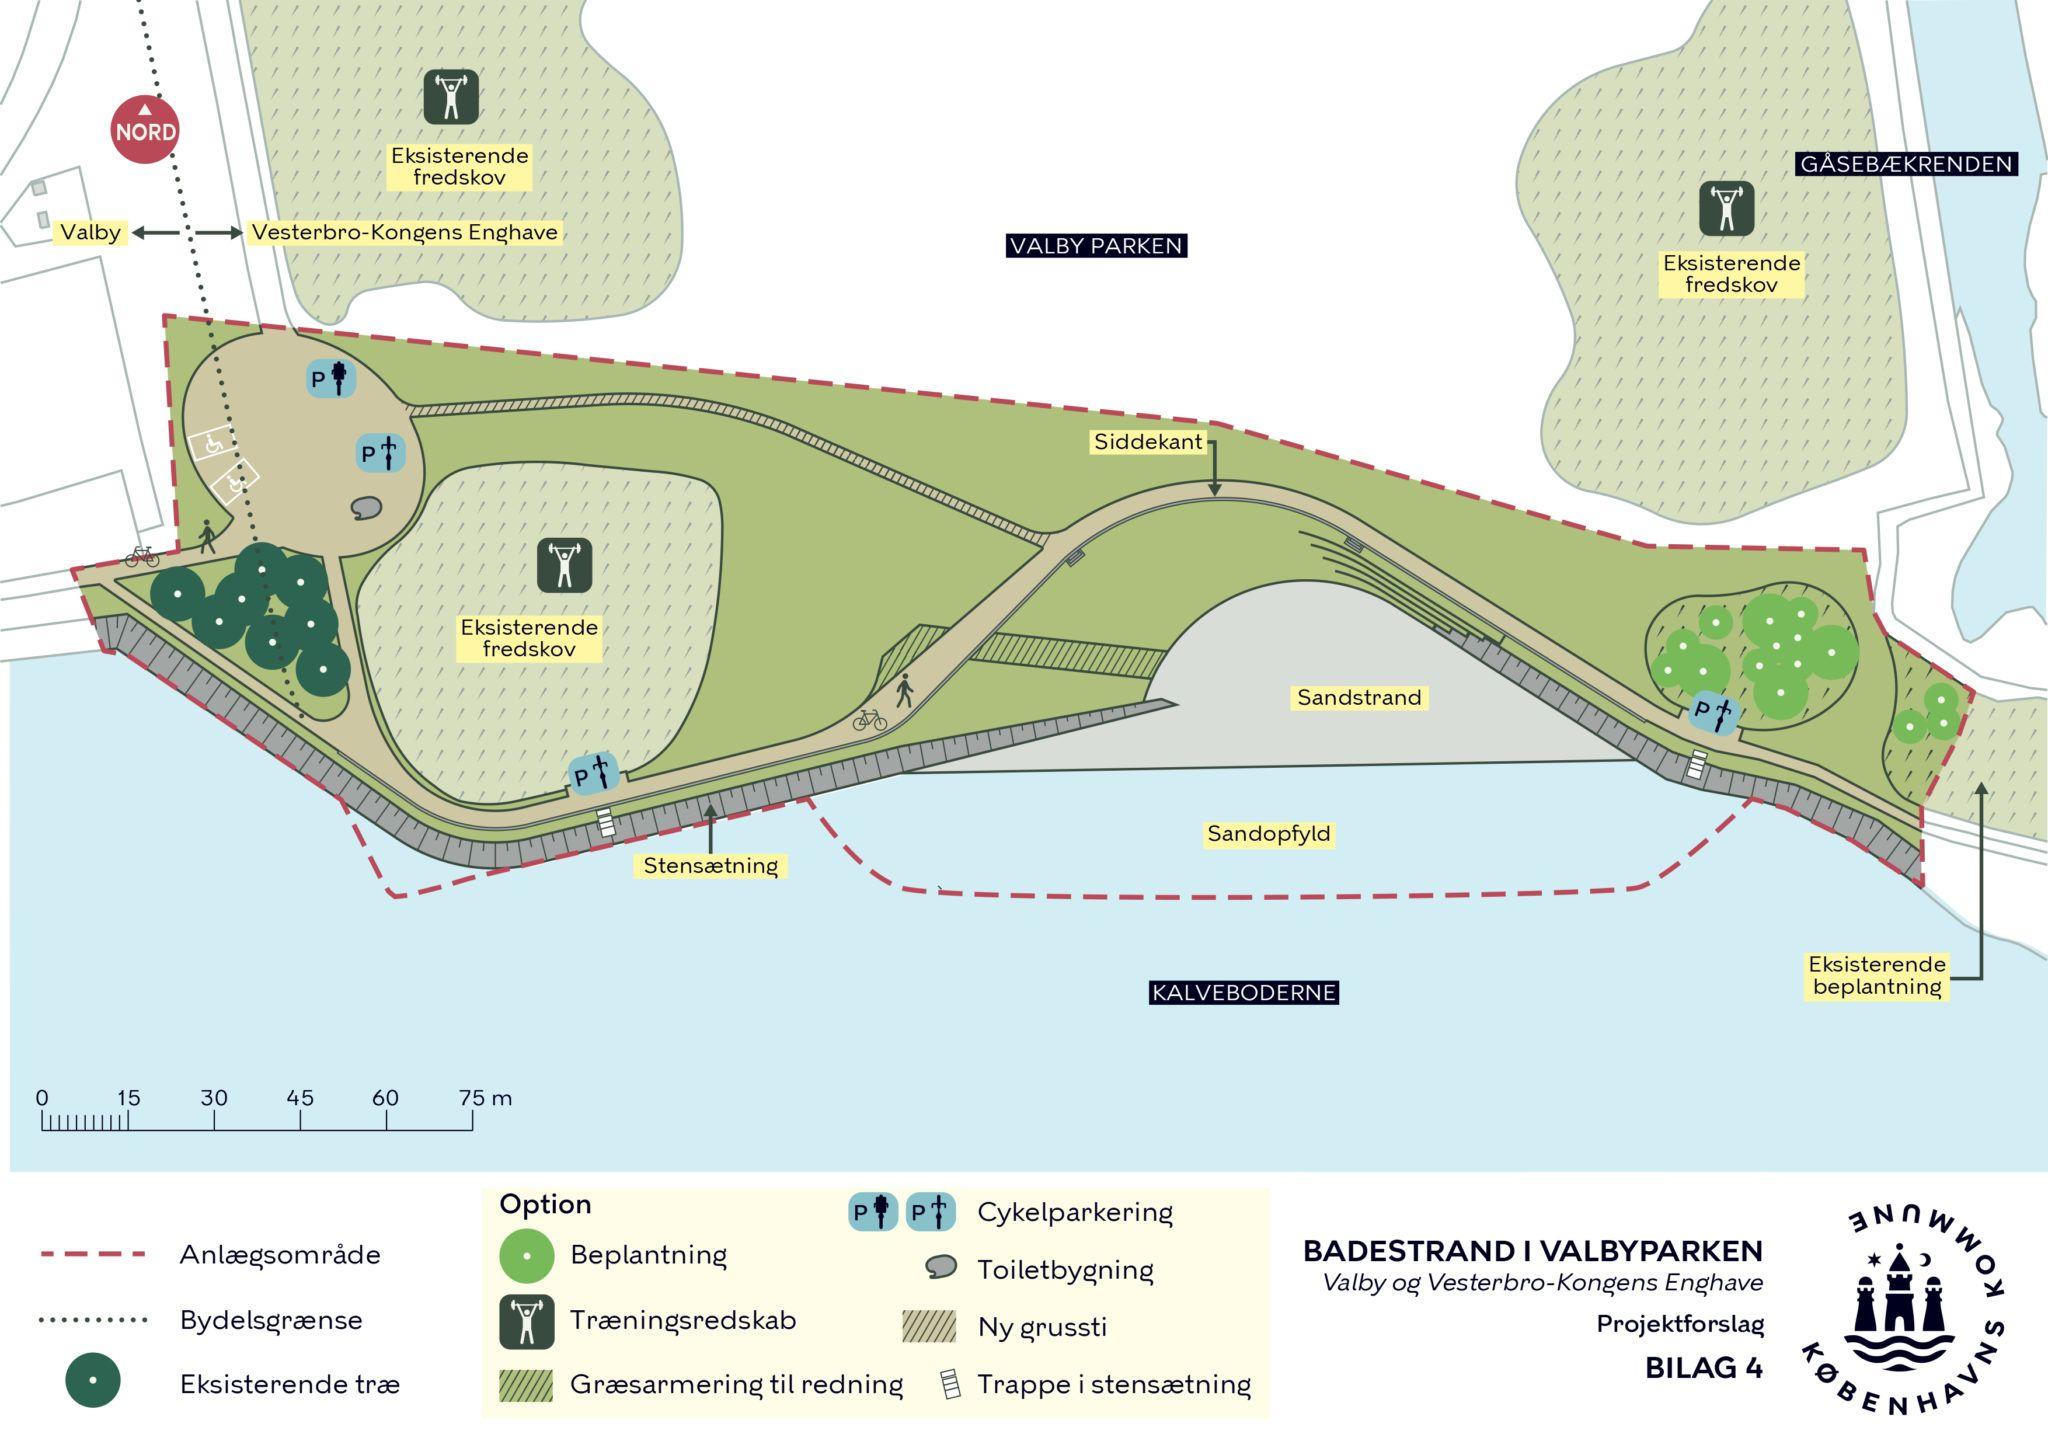 Badestrand i Valbyparken projektforslag 2019